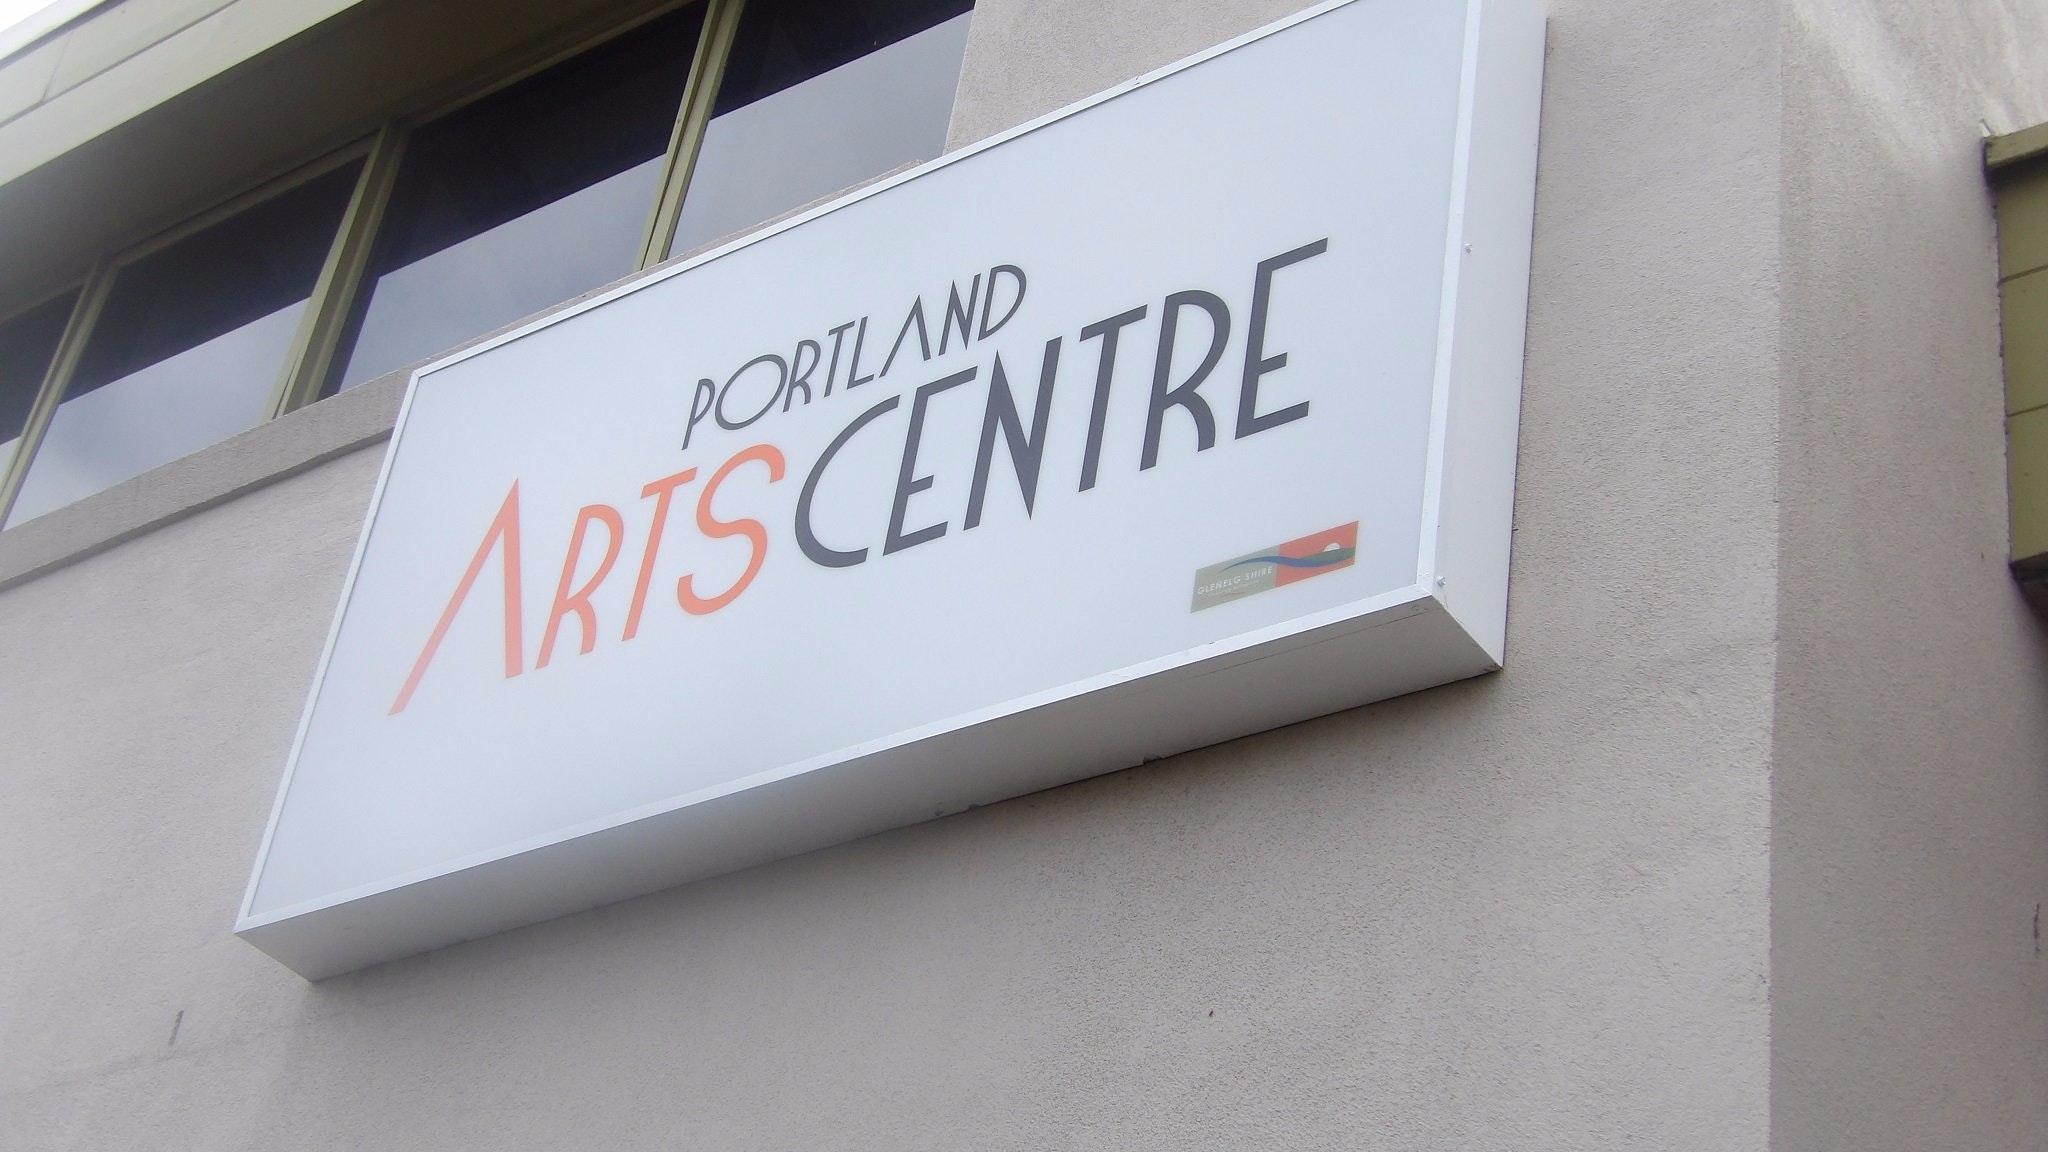 Portland Arts Centre